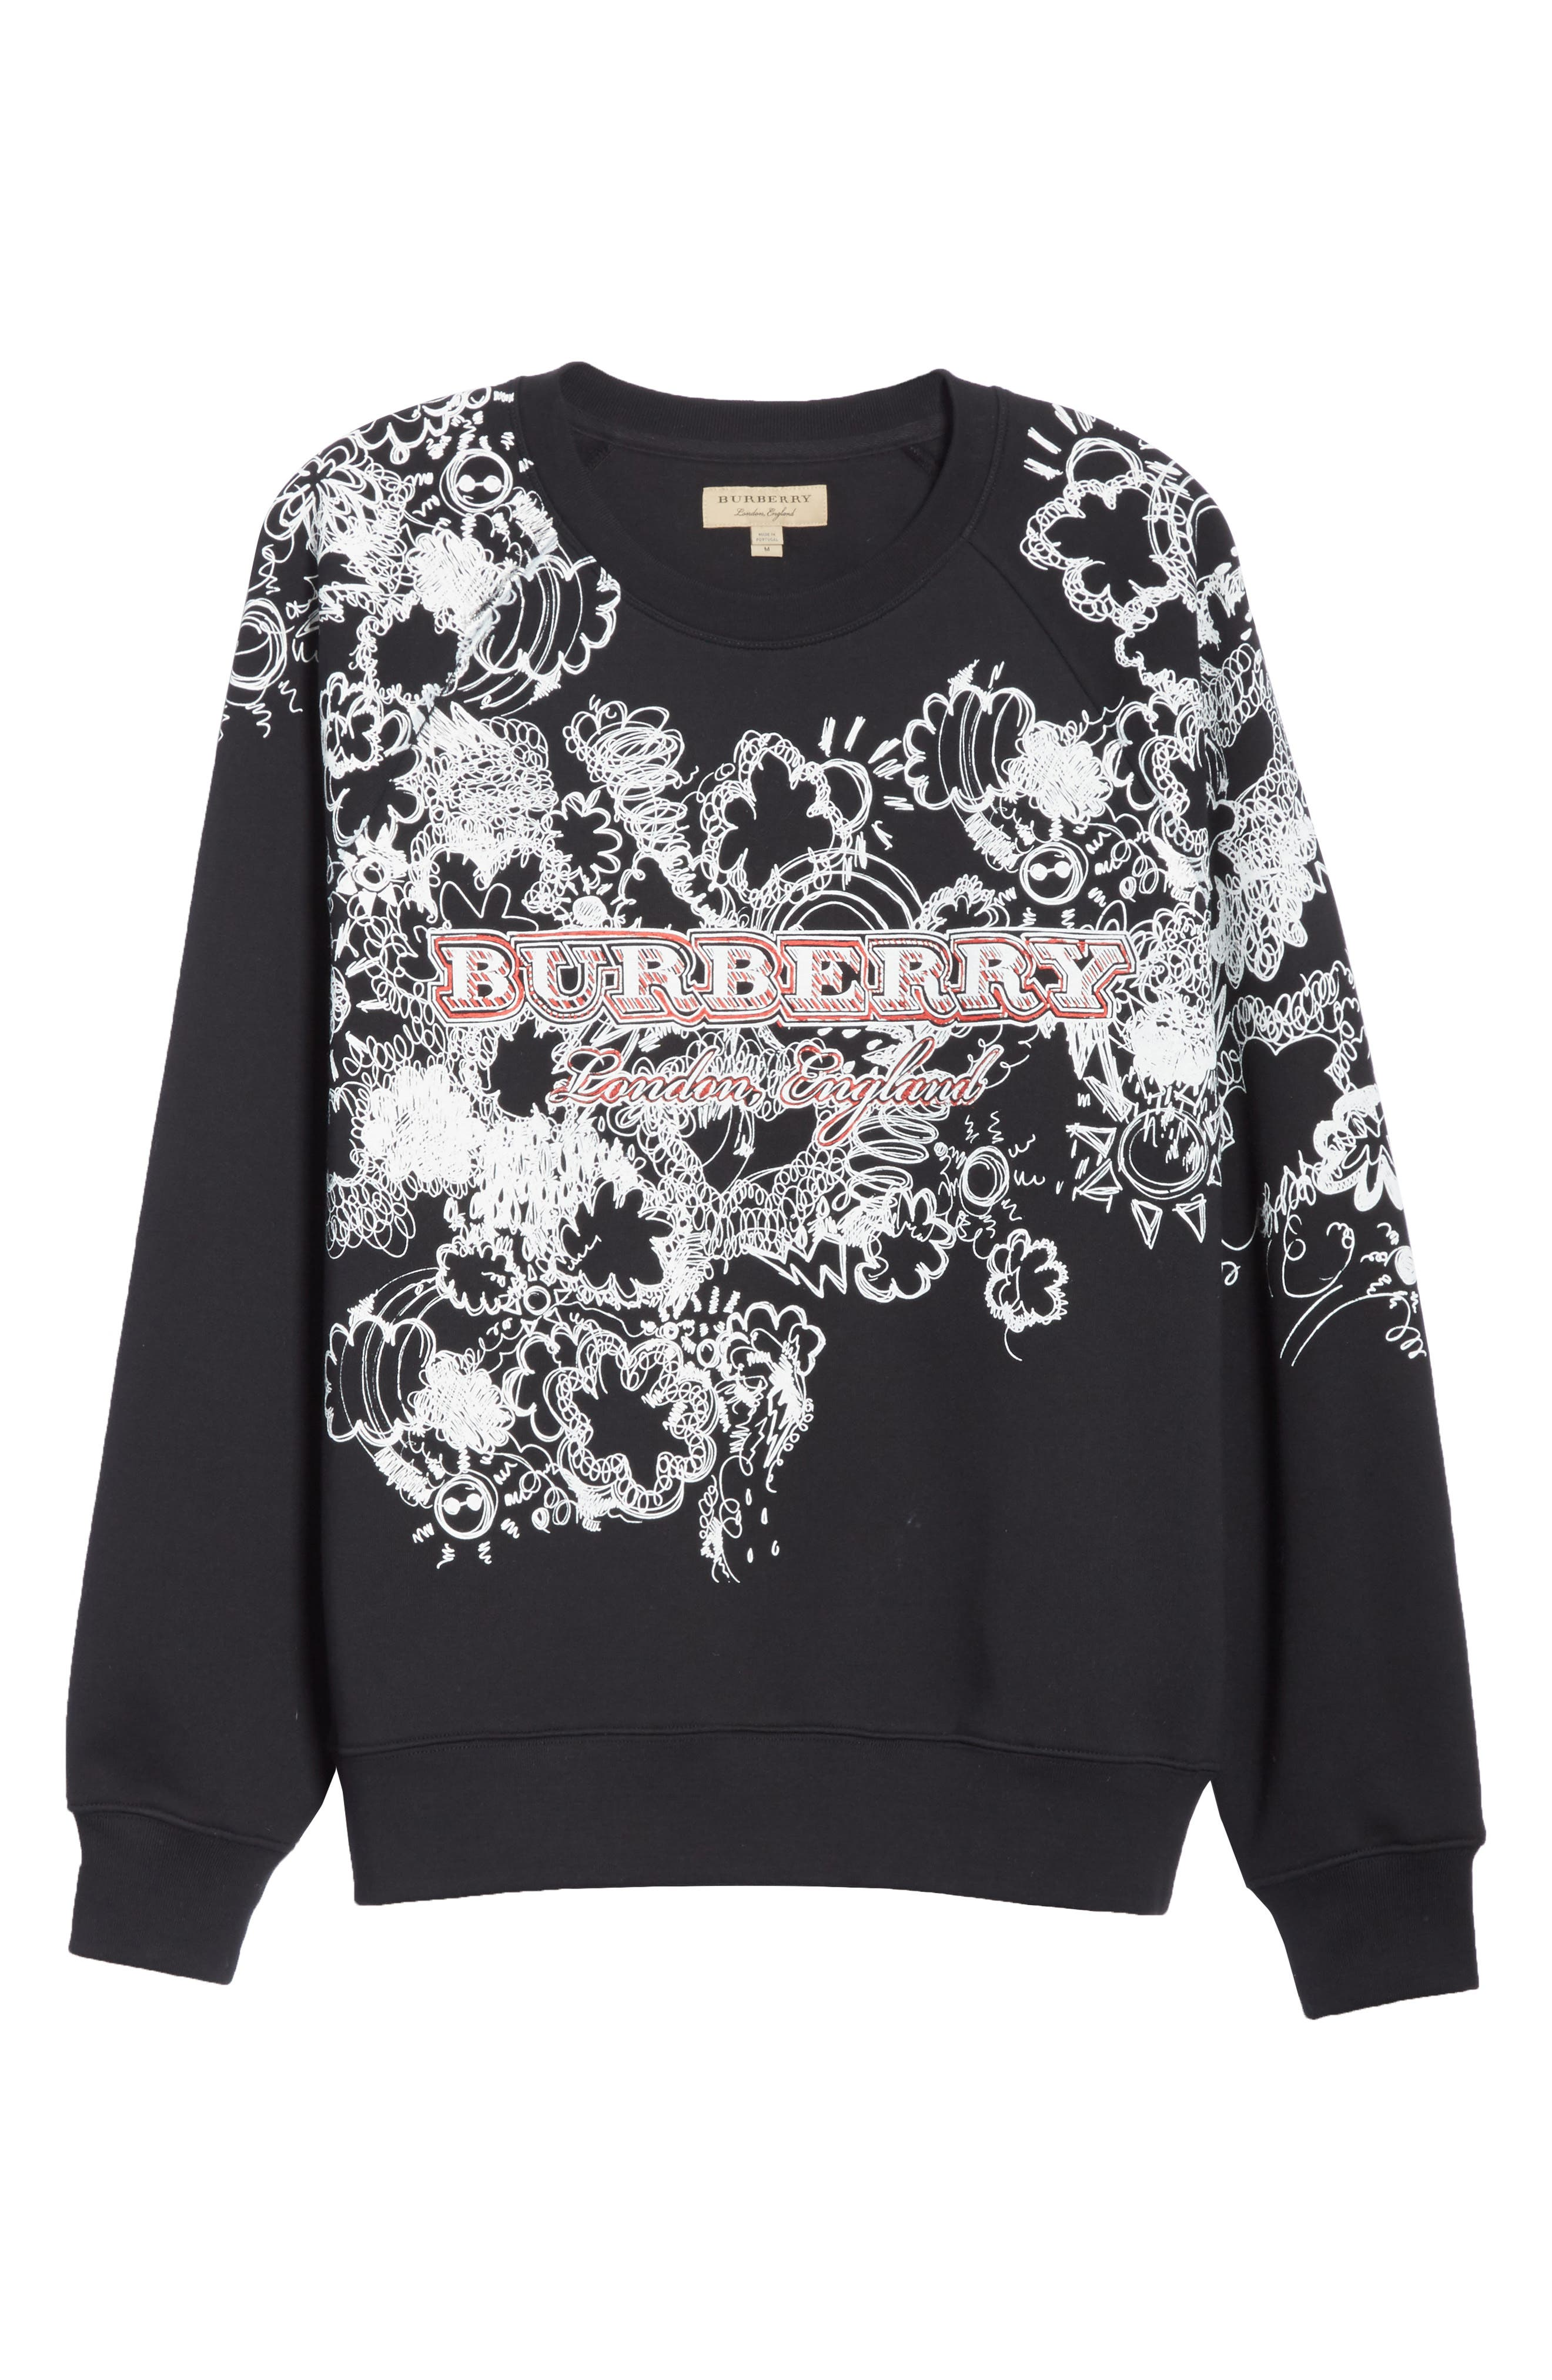 Barford Crewneck Sweatshirt,                             Alternate thumbnail 6, color,                             Black